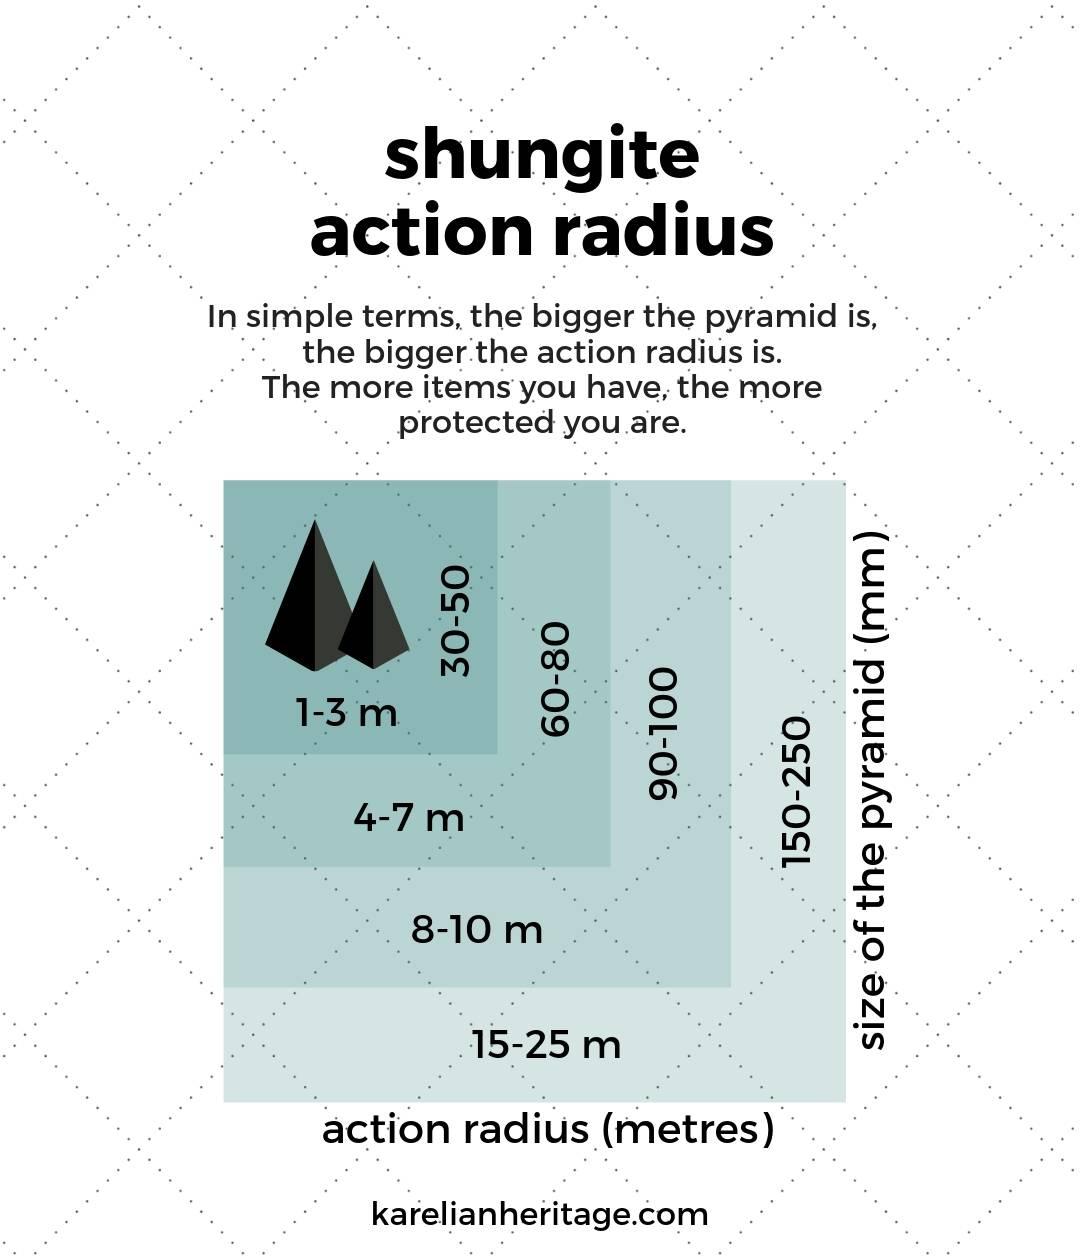 shungite-action-radius